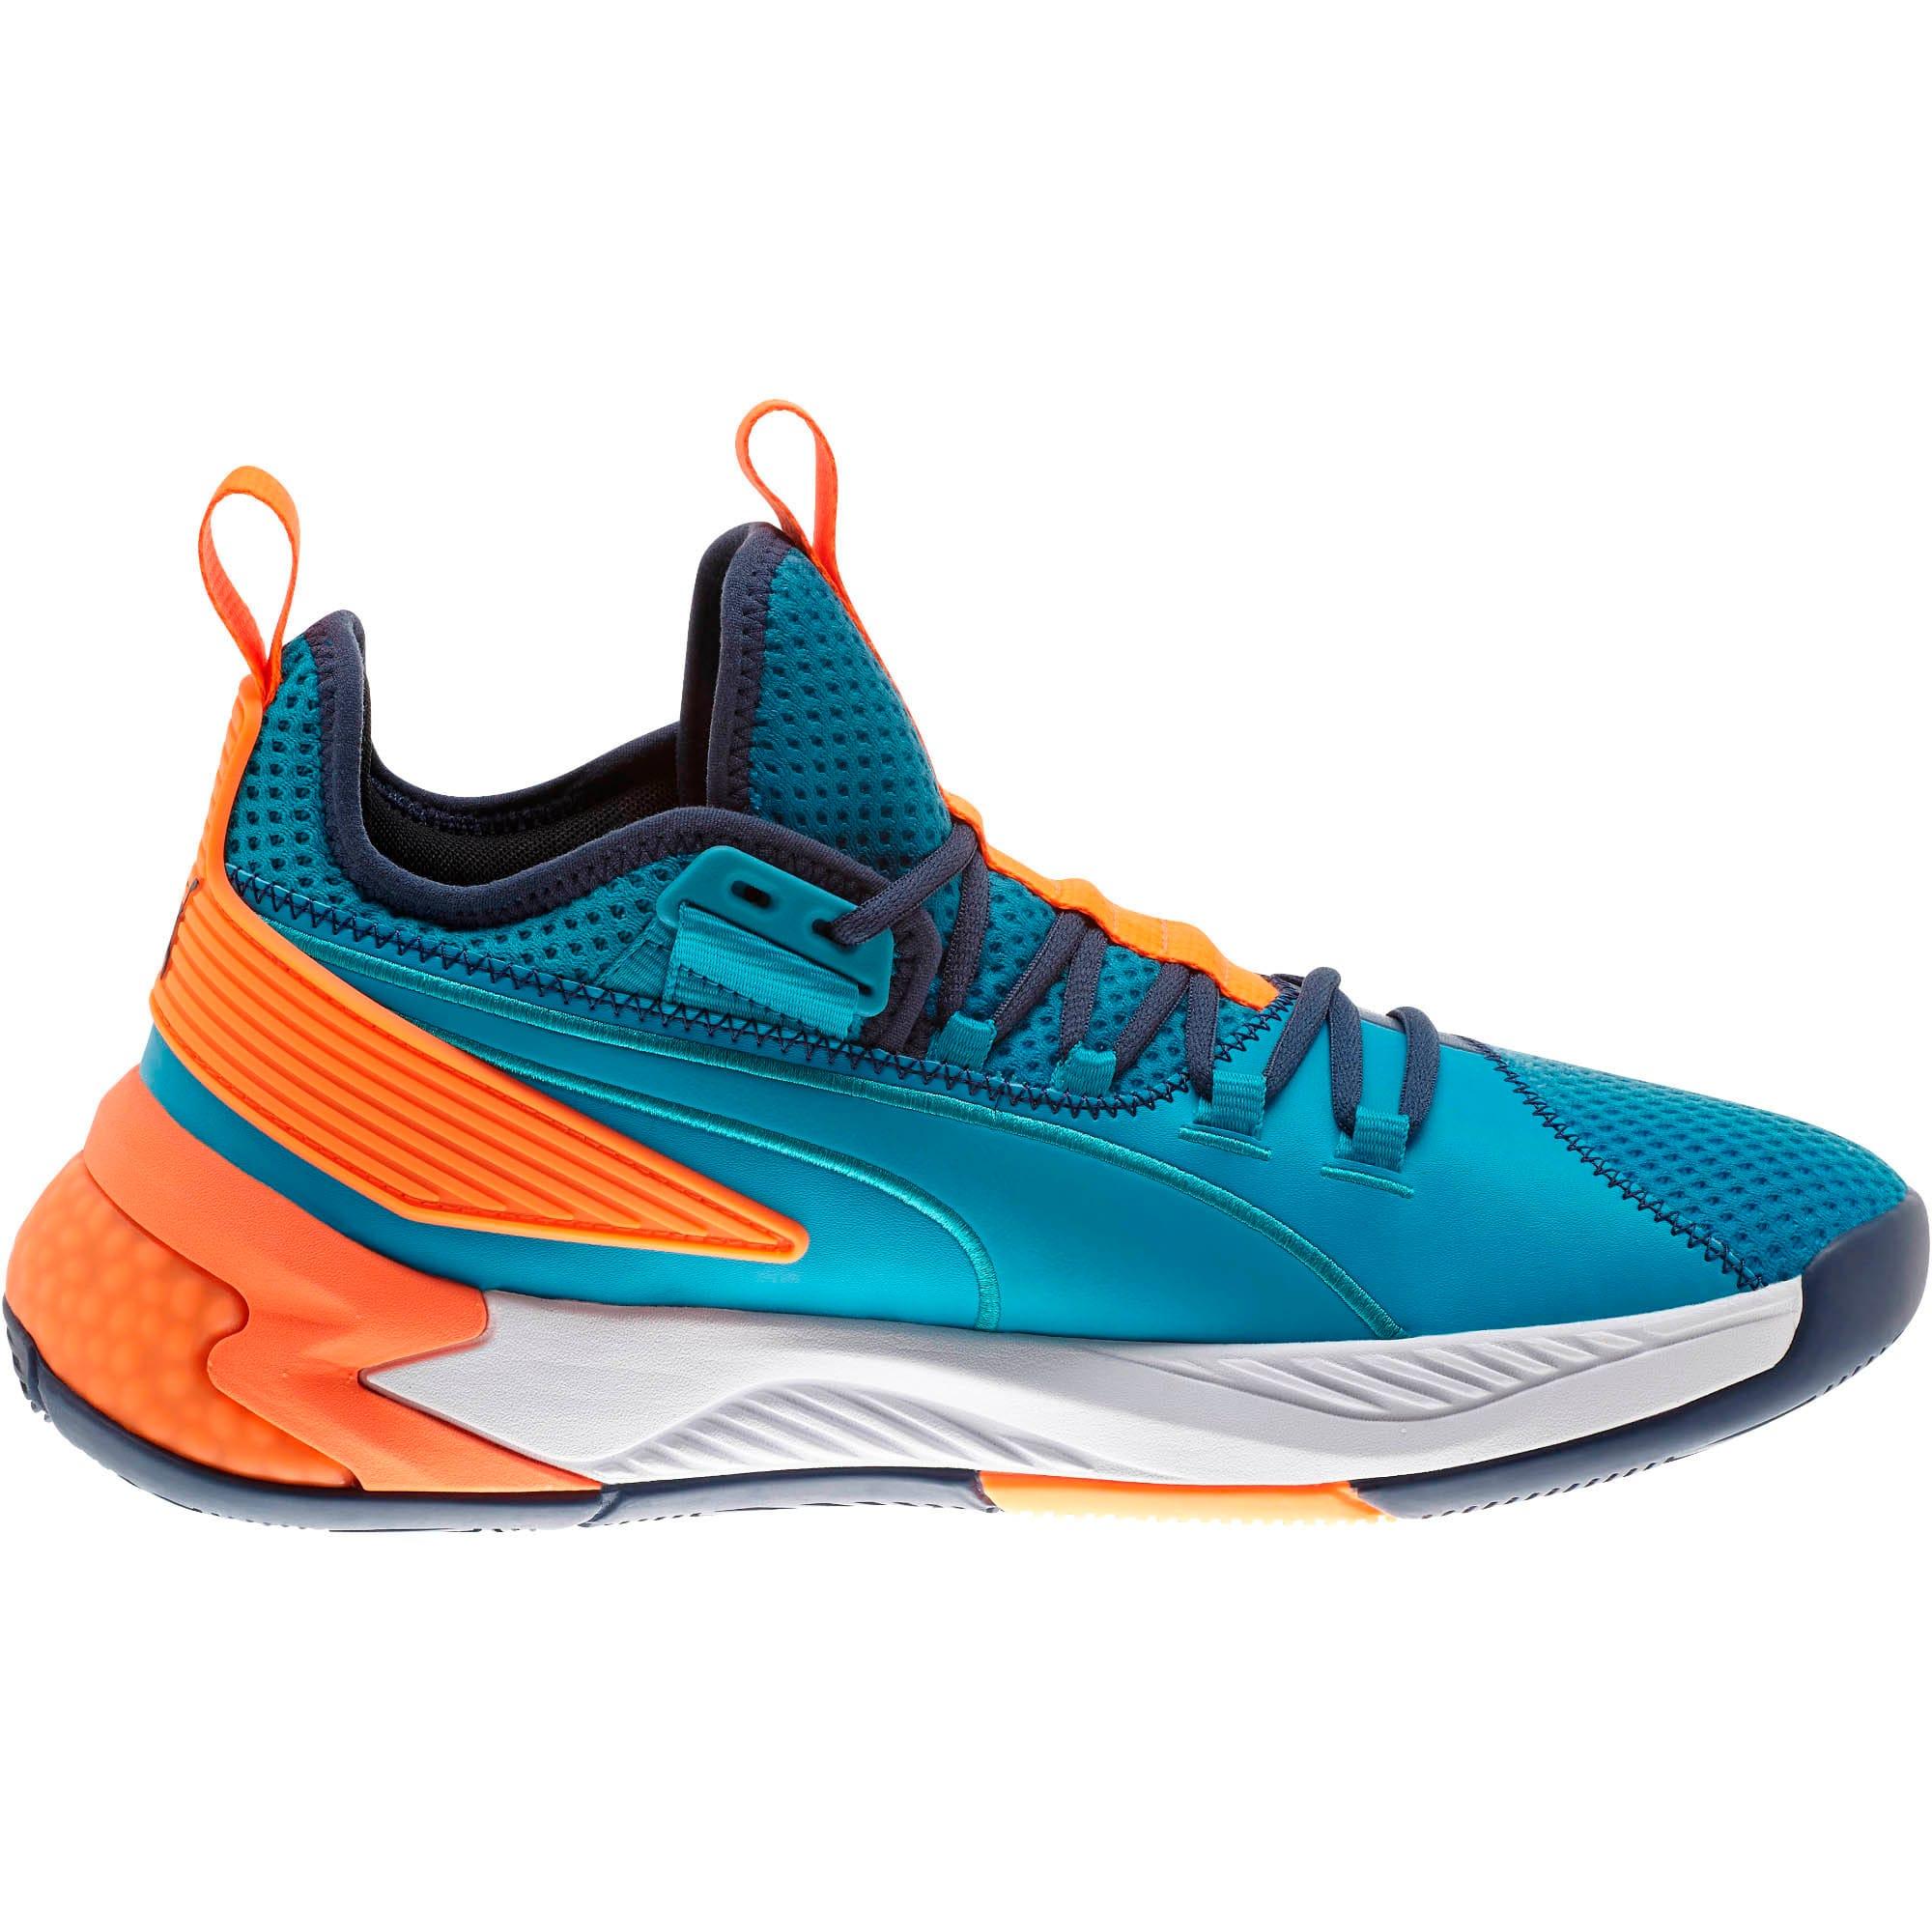 Thumbnail 5 of Uproar Charlotte ASG Fade Basketball Shoes, Orange- PURPLE, medium